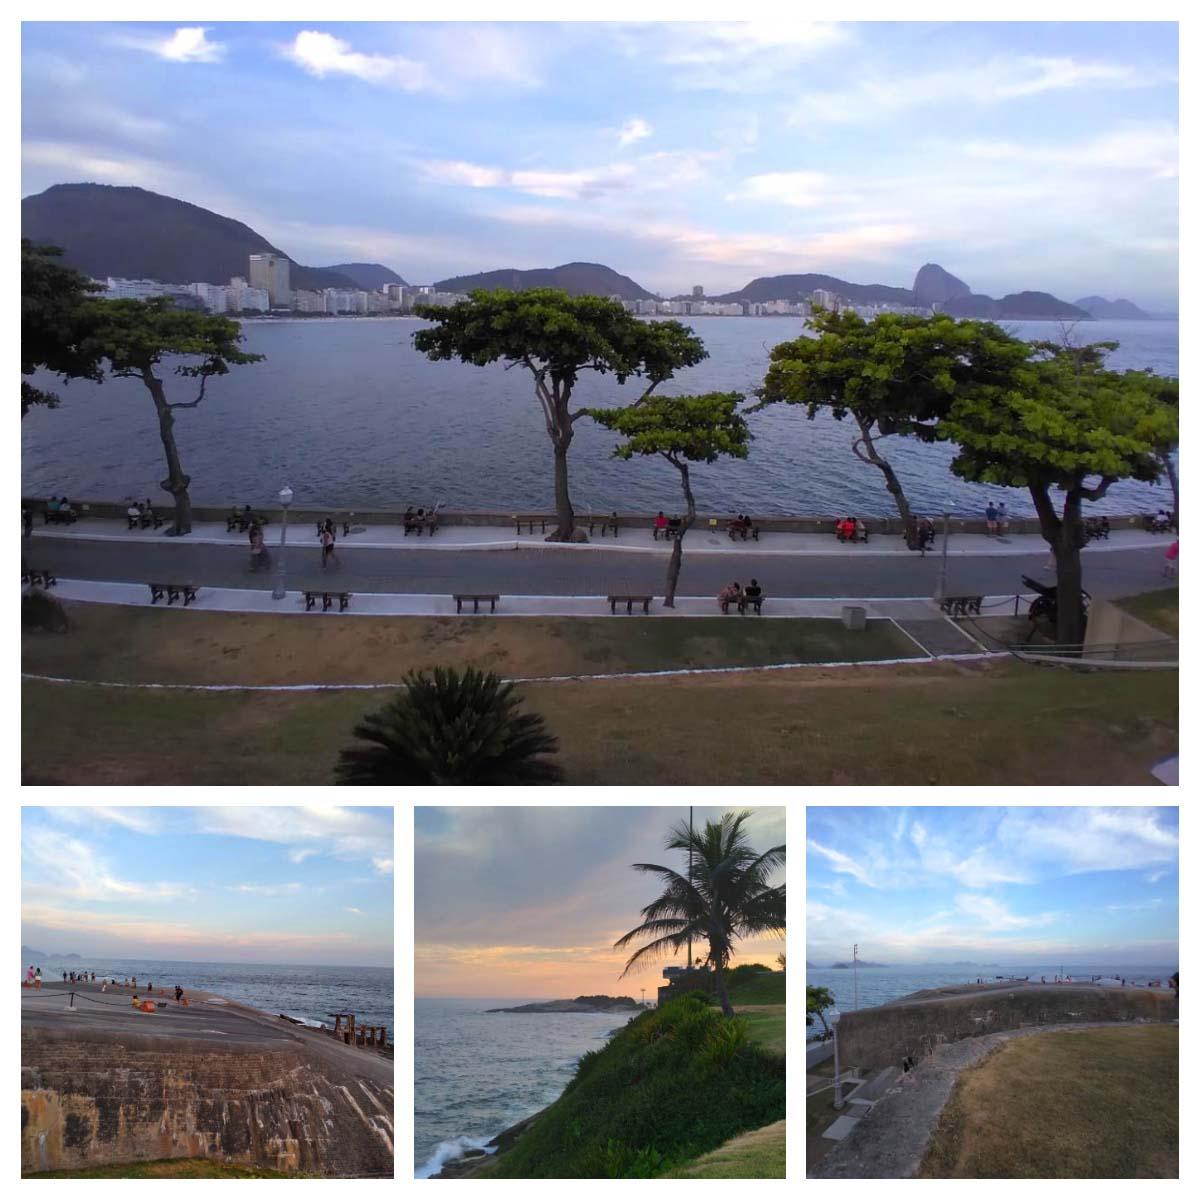 Mirante do Forte Copacabana no Rio de Janeiro